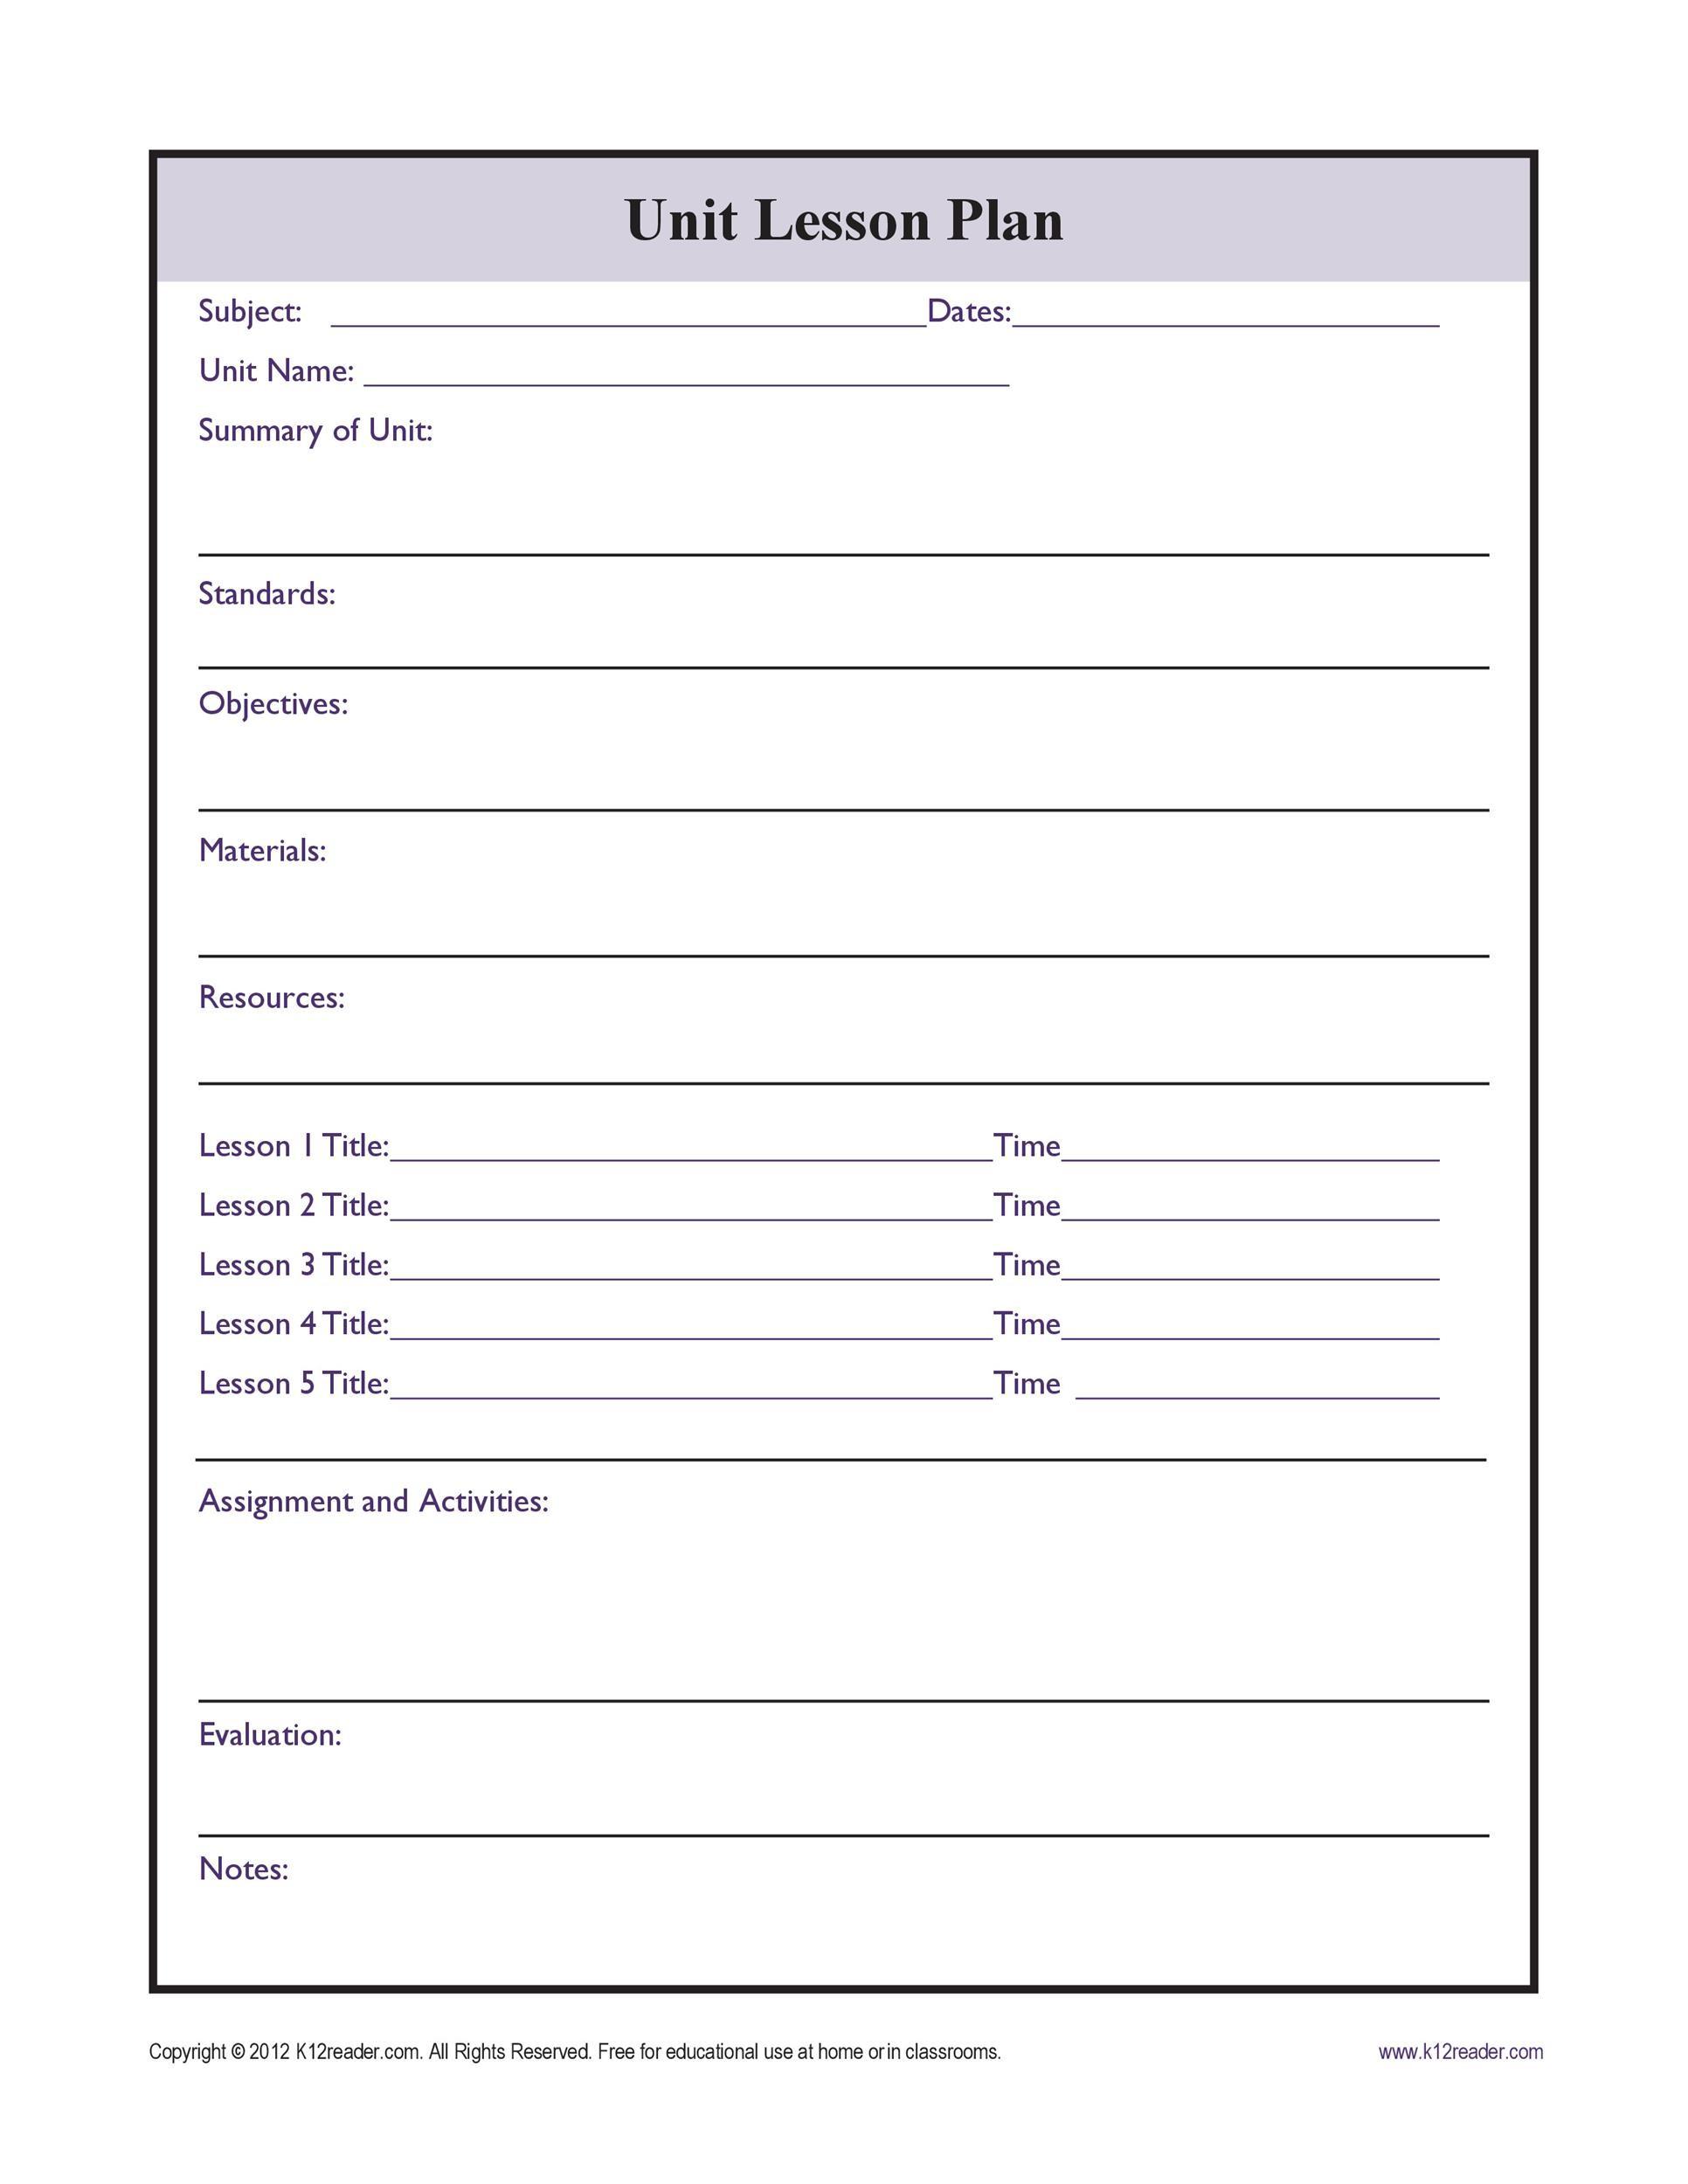 Free unit plan template 09